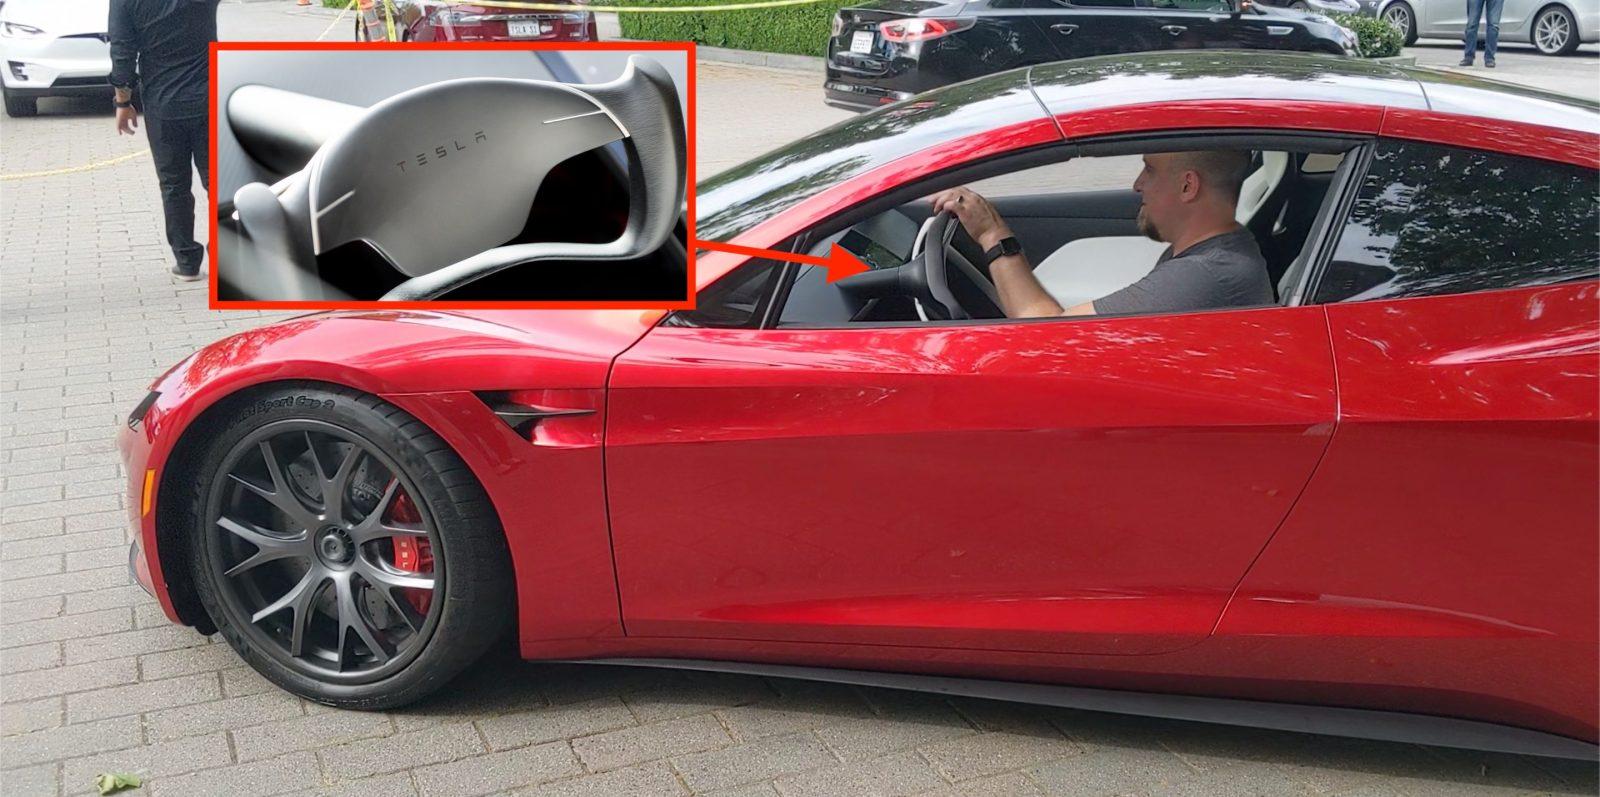 Watch Tesla Roadster's special steering wheel in action